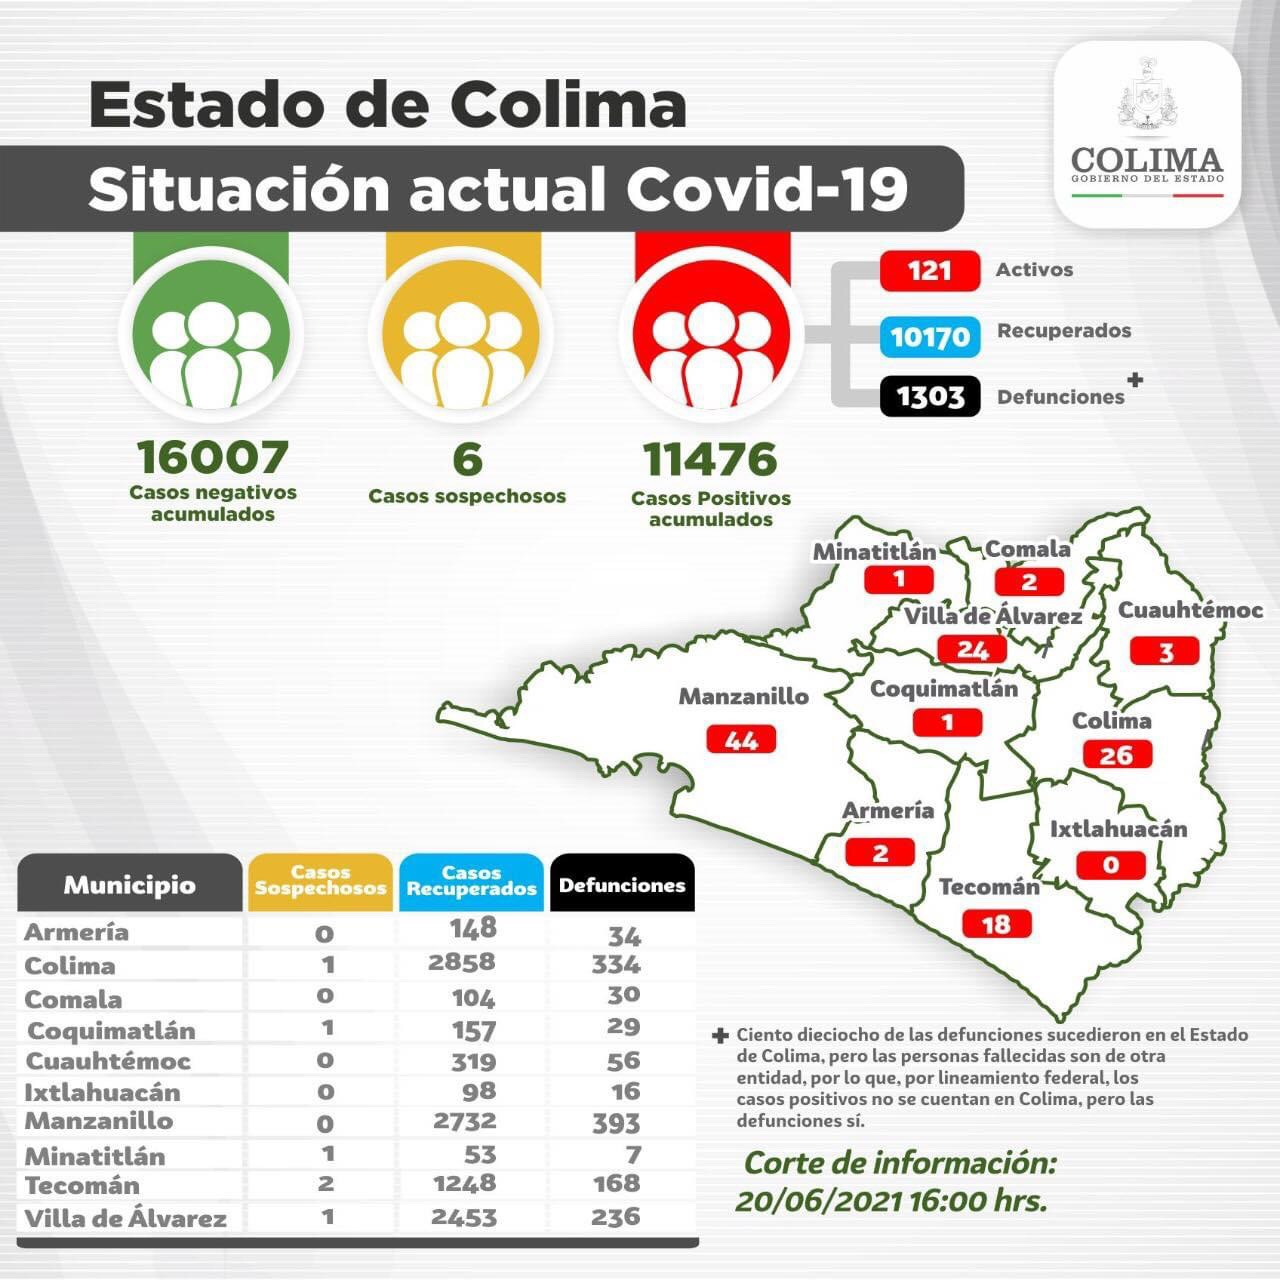 Colima, por primera vez, no reporta casos positivos o muertos por Covid-19.